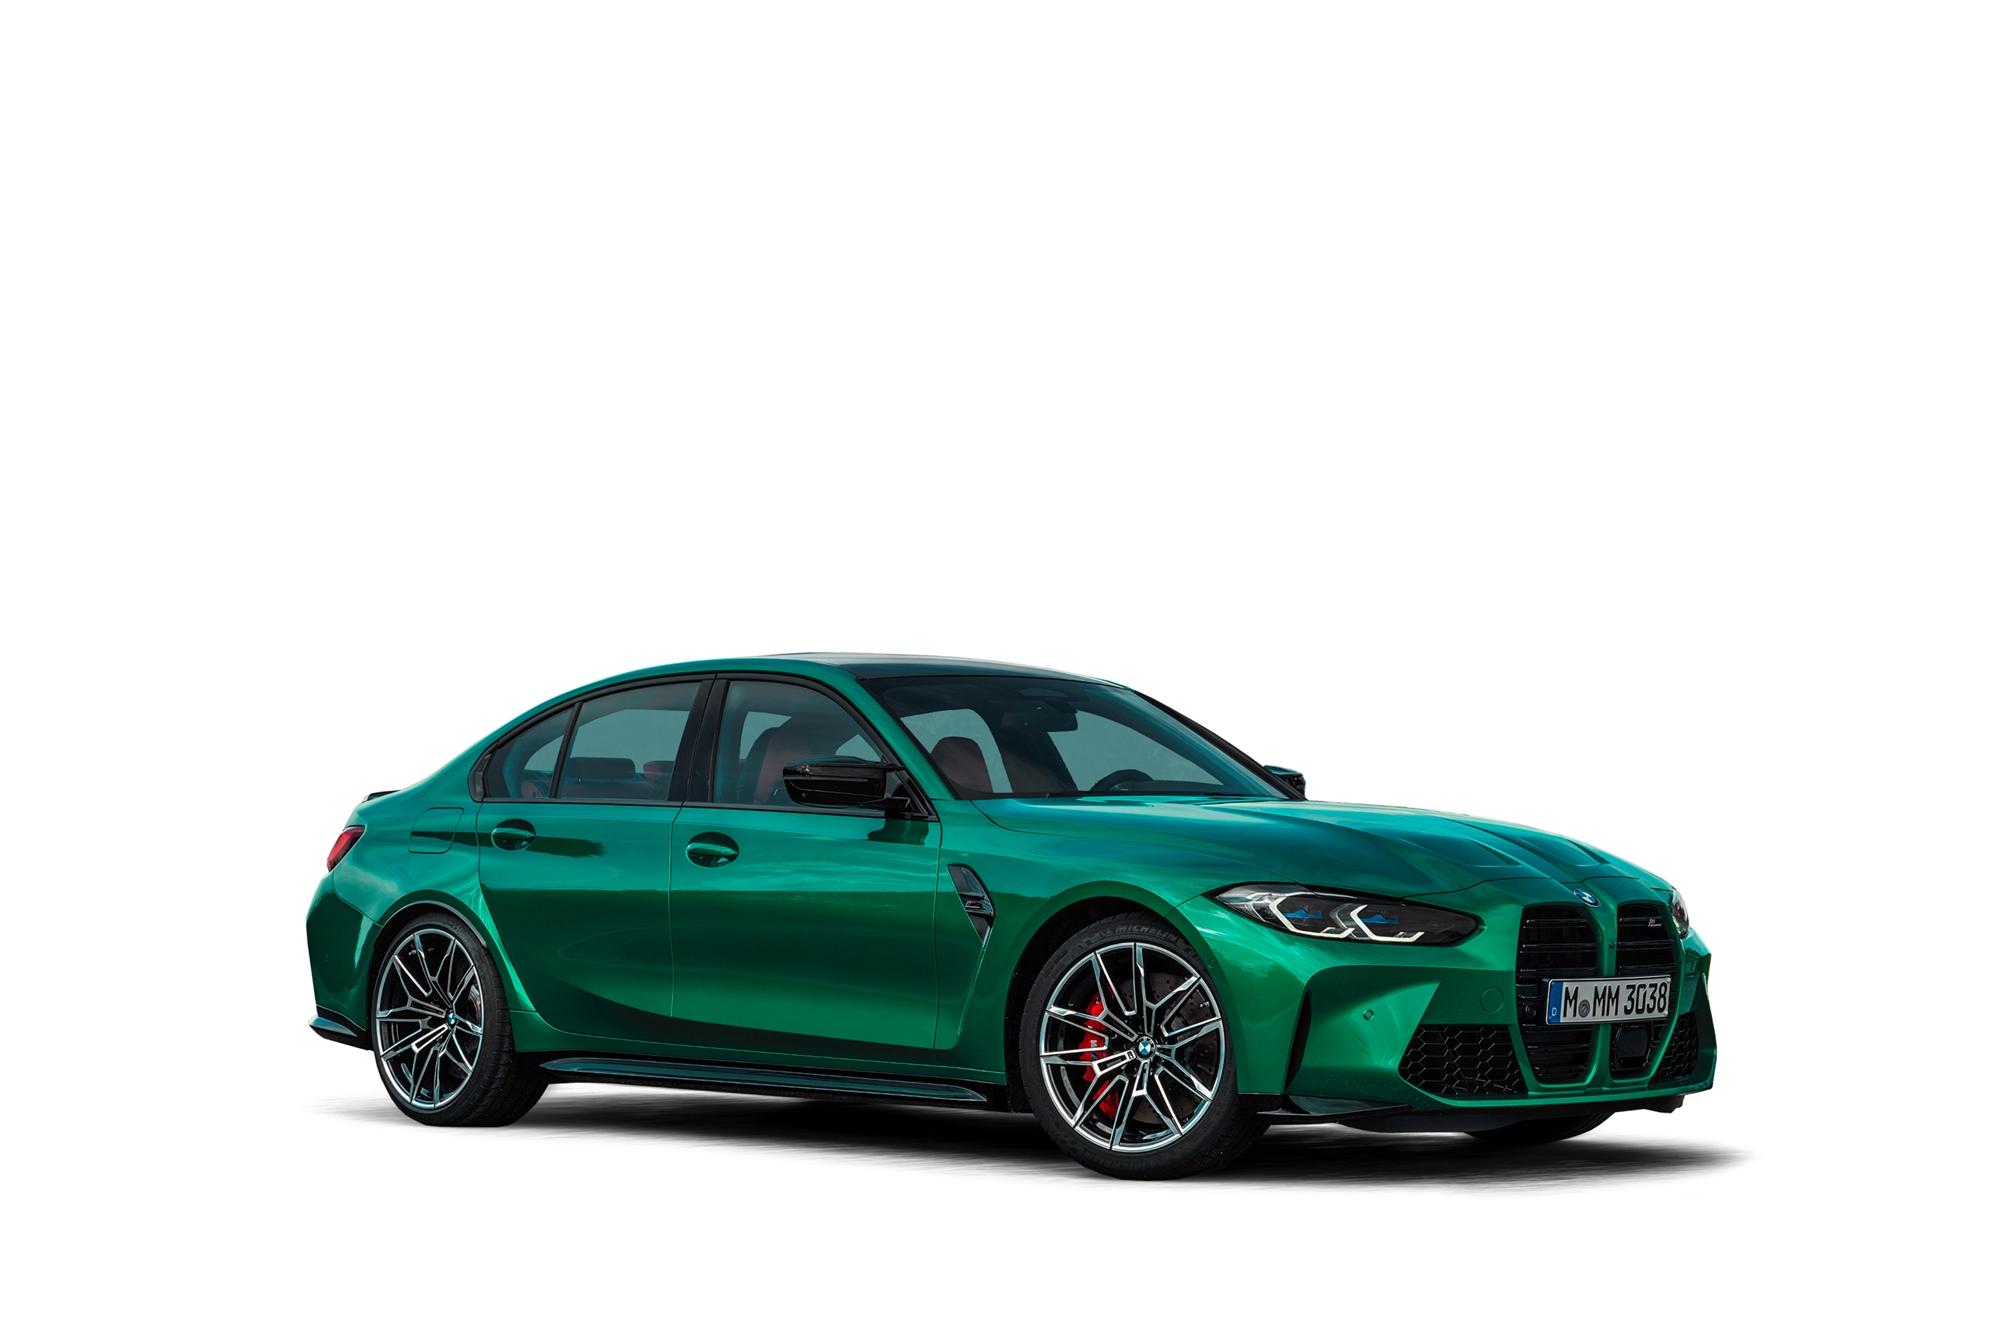 2021 BMW M3 Sedan Full Specs, Features and Price | CarBuzz